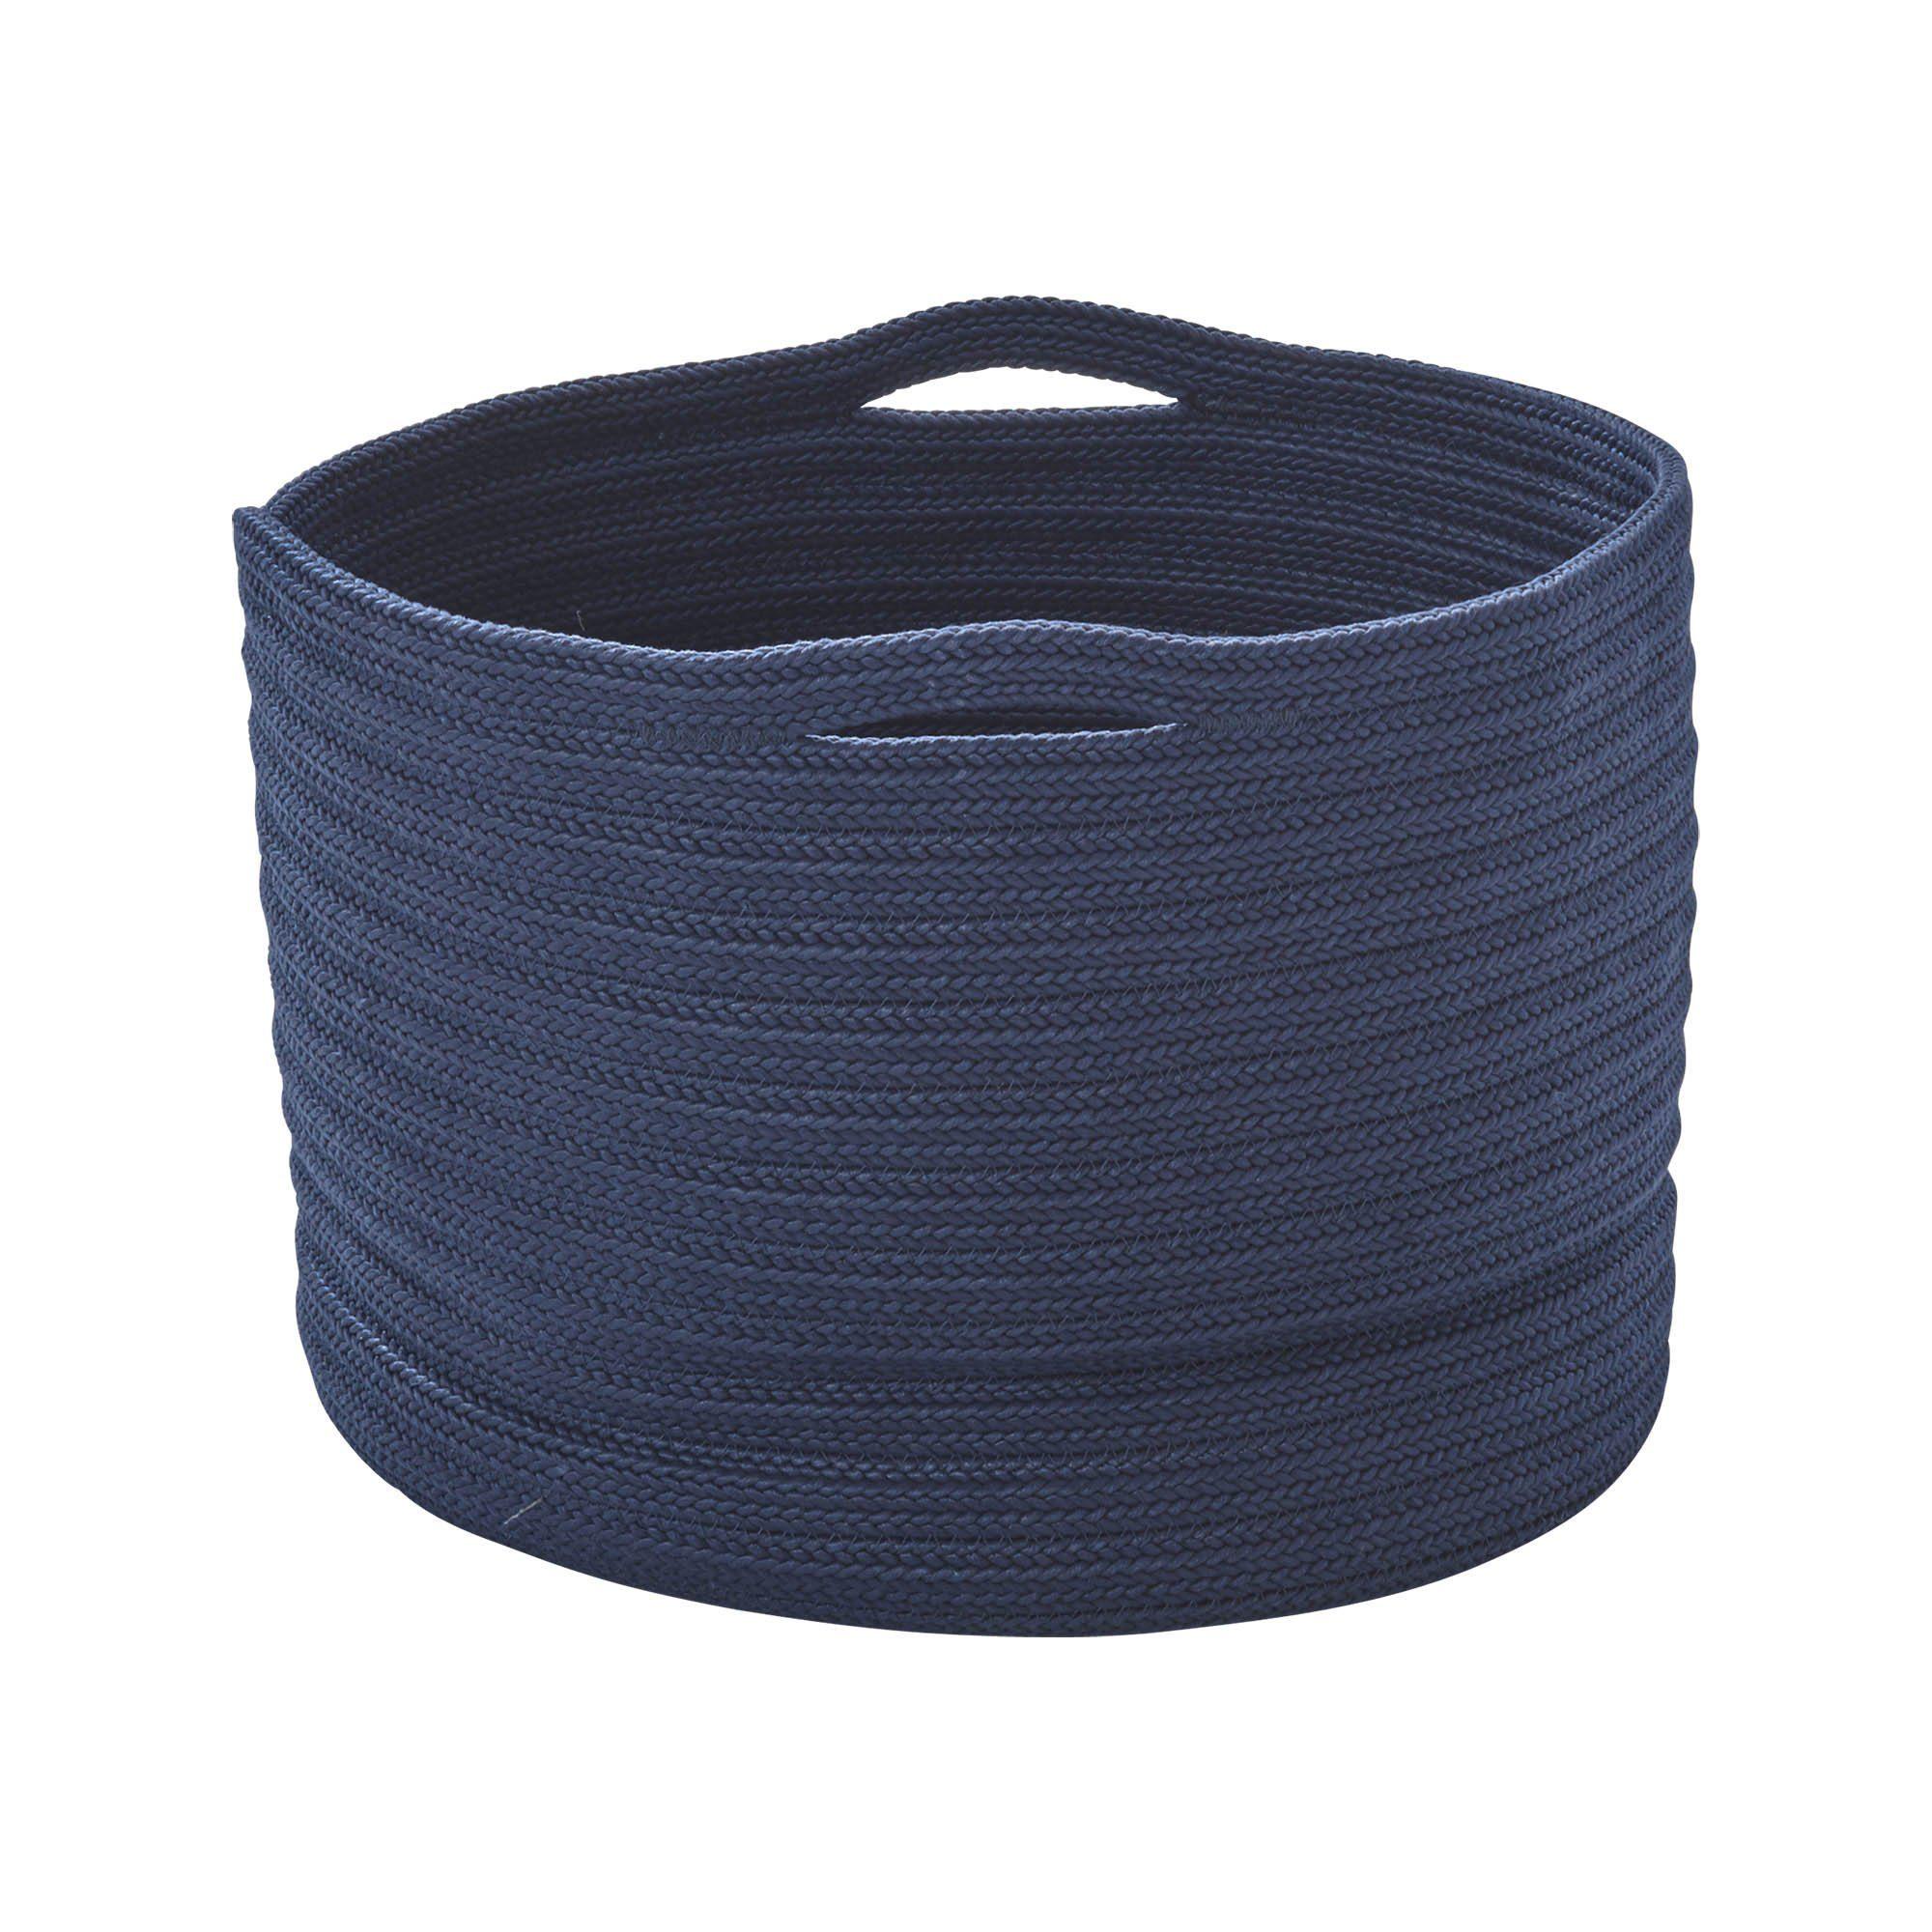 Soft korg från Cane-Line i blå polypropylen.